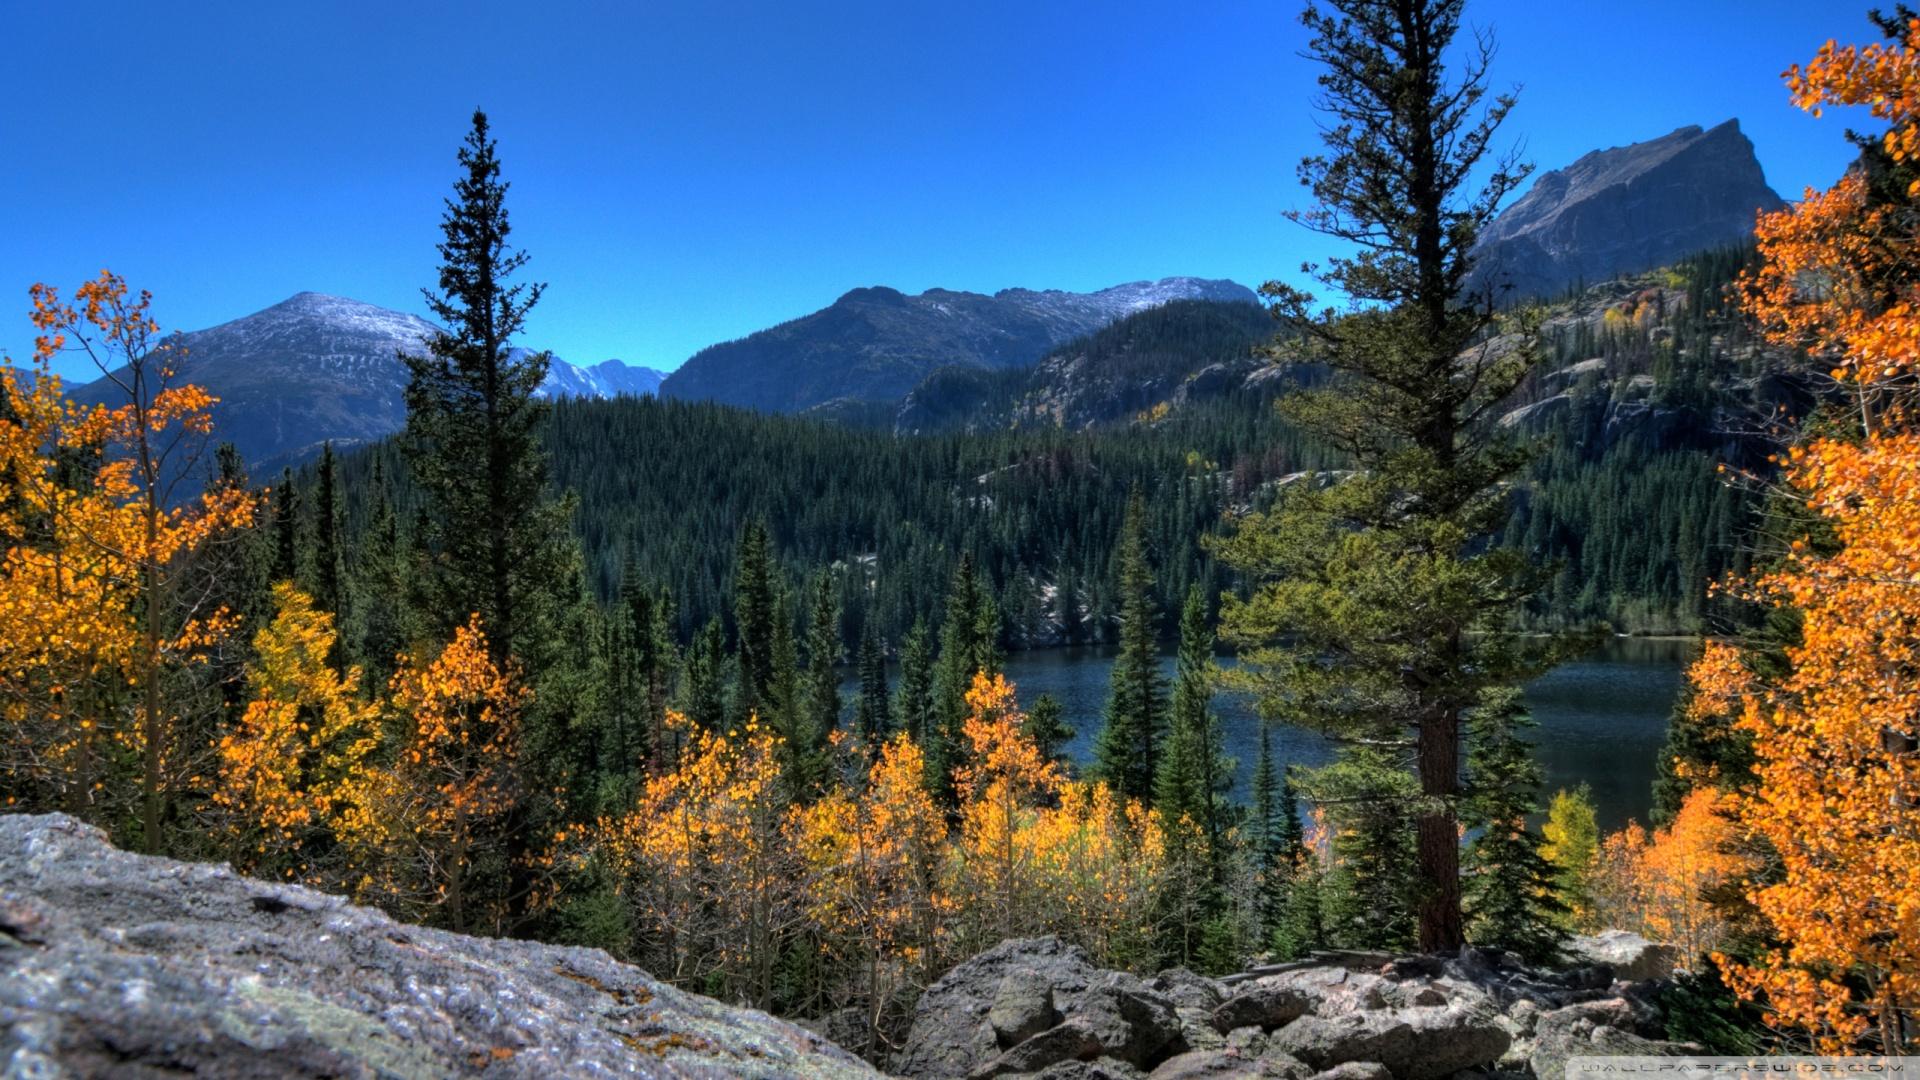 Bear Lake Rocky Mountain National Park Colorado Wallpaper 1920x1080 1920x1080